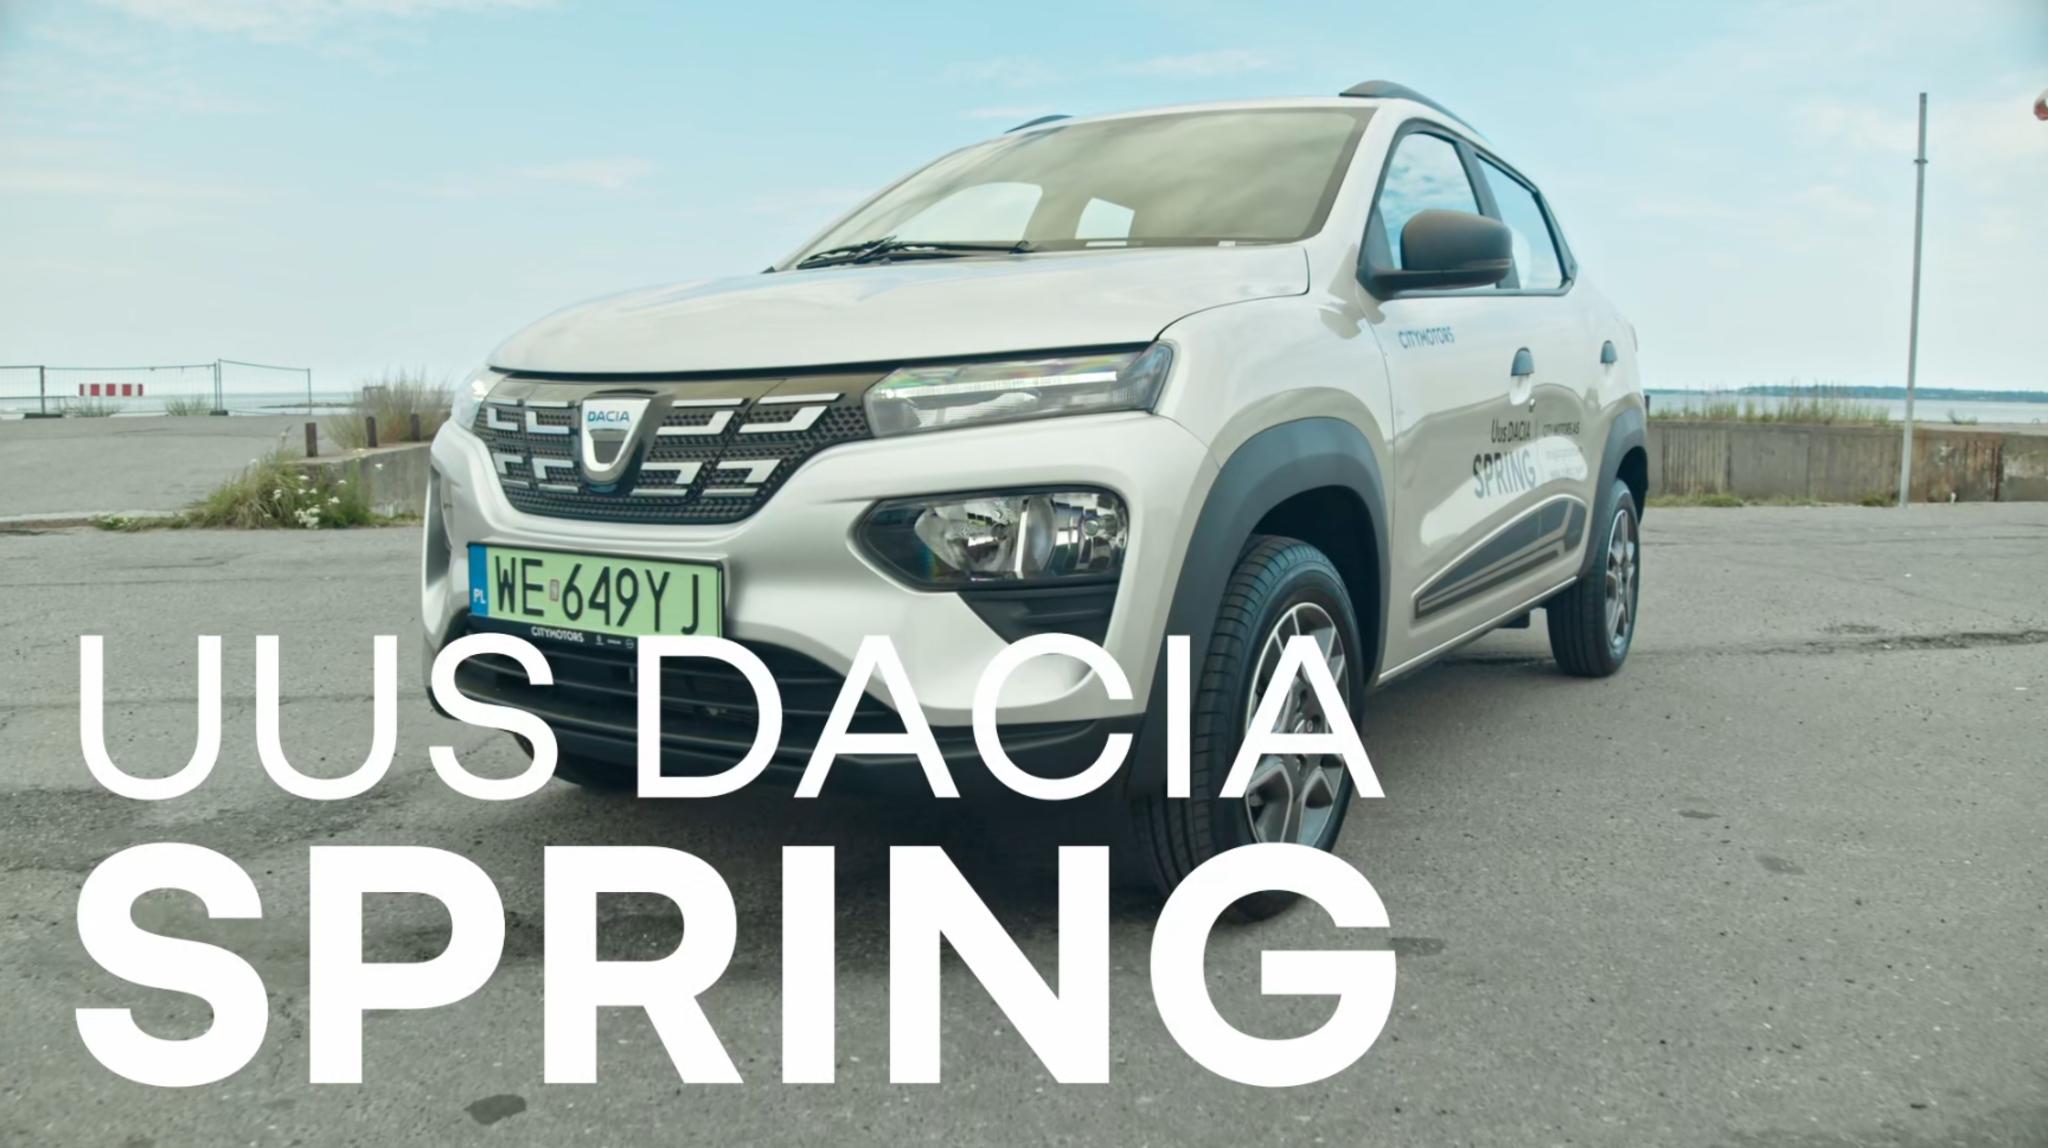 Spring Electric on kohal!